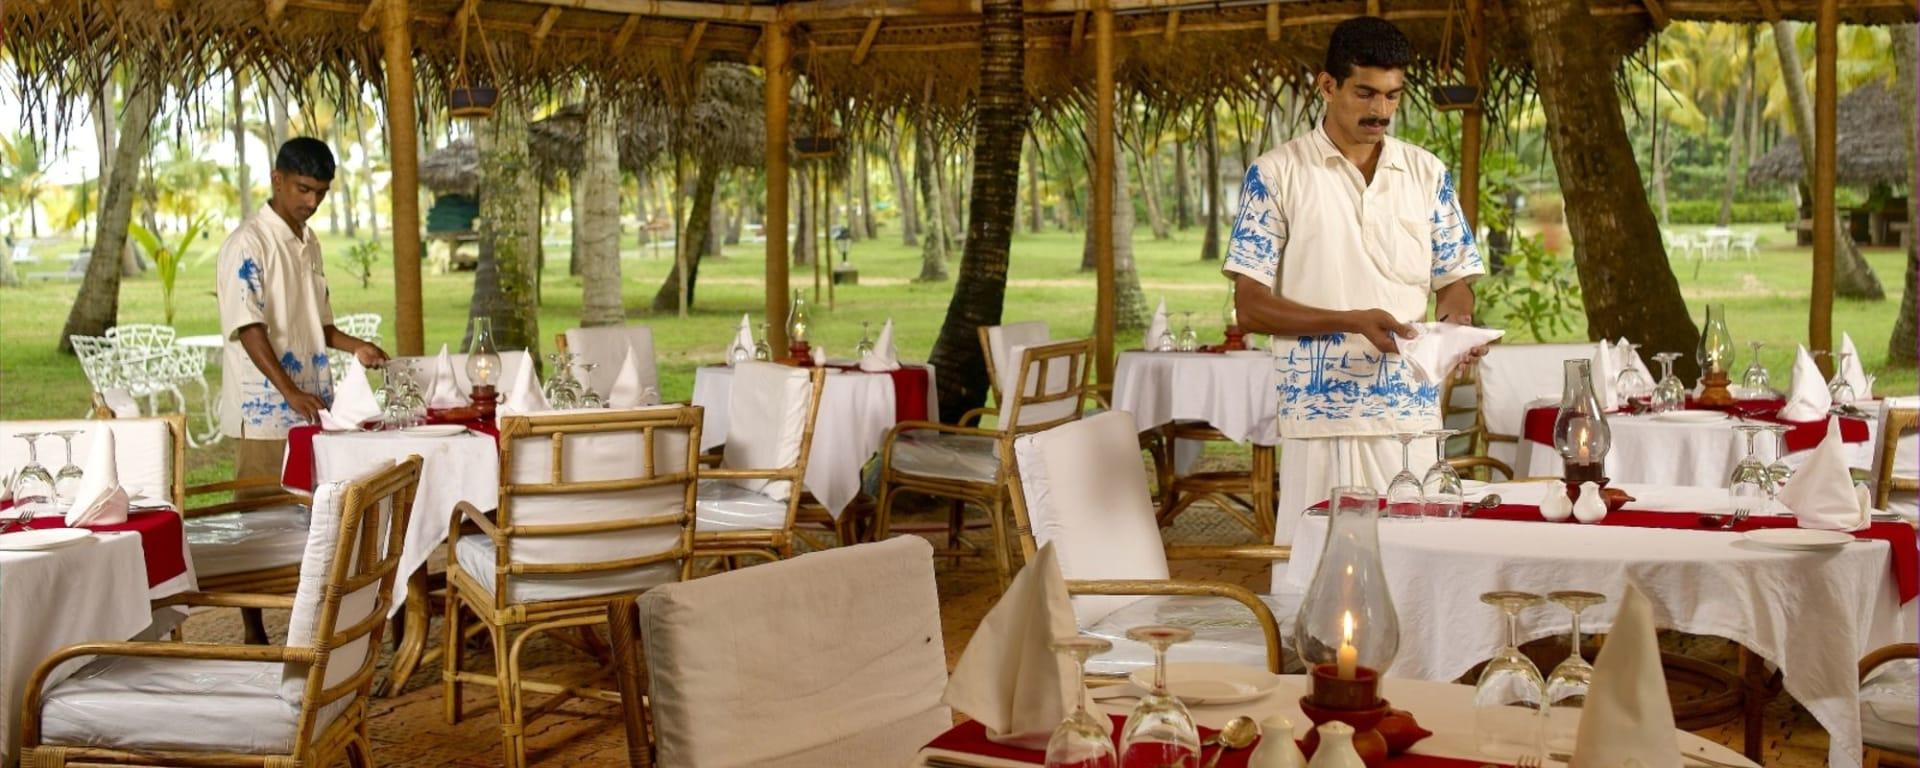 Marari Beach Resort à Mararikulam: Beach Grill Restaurant